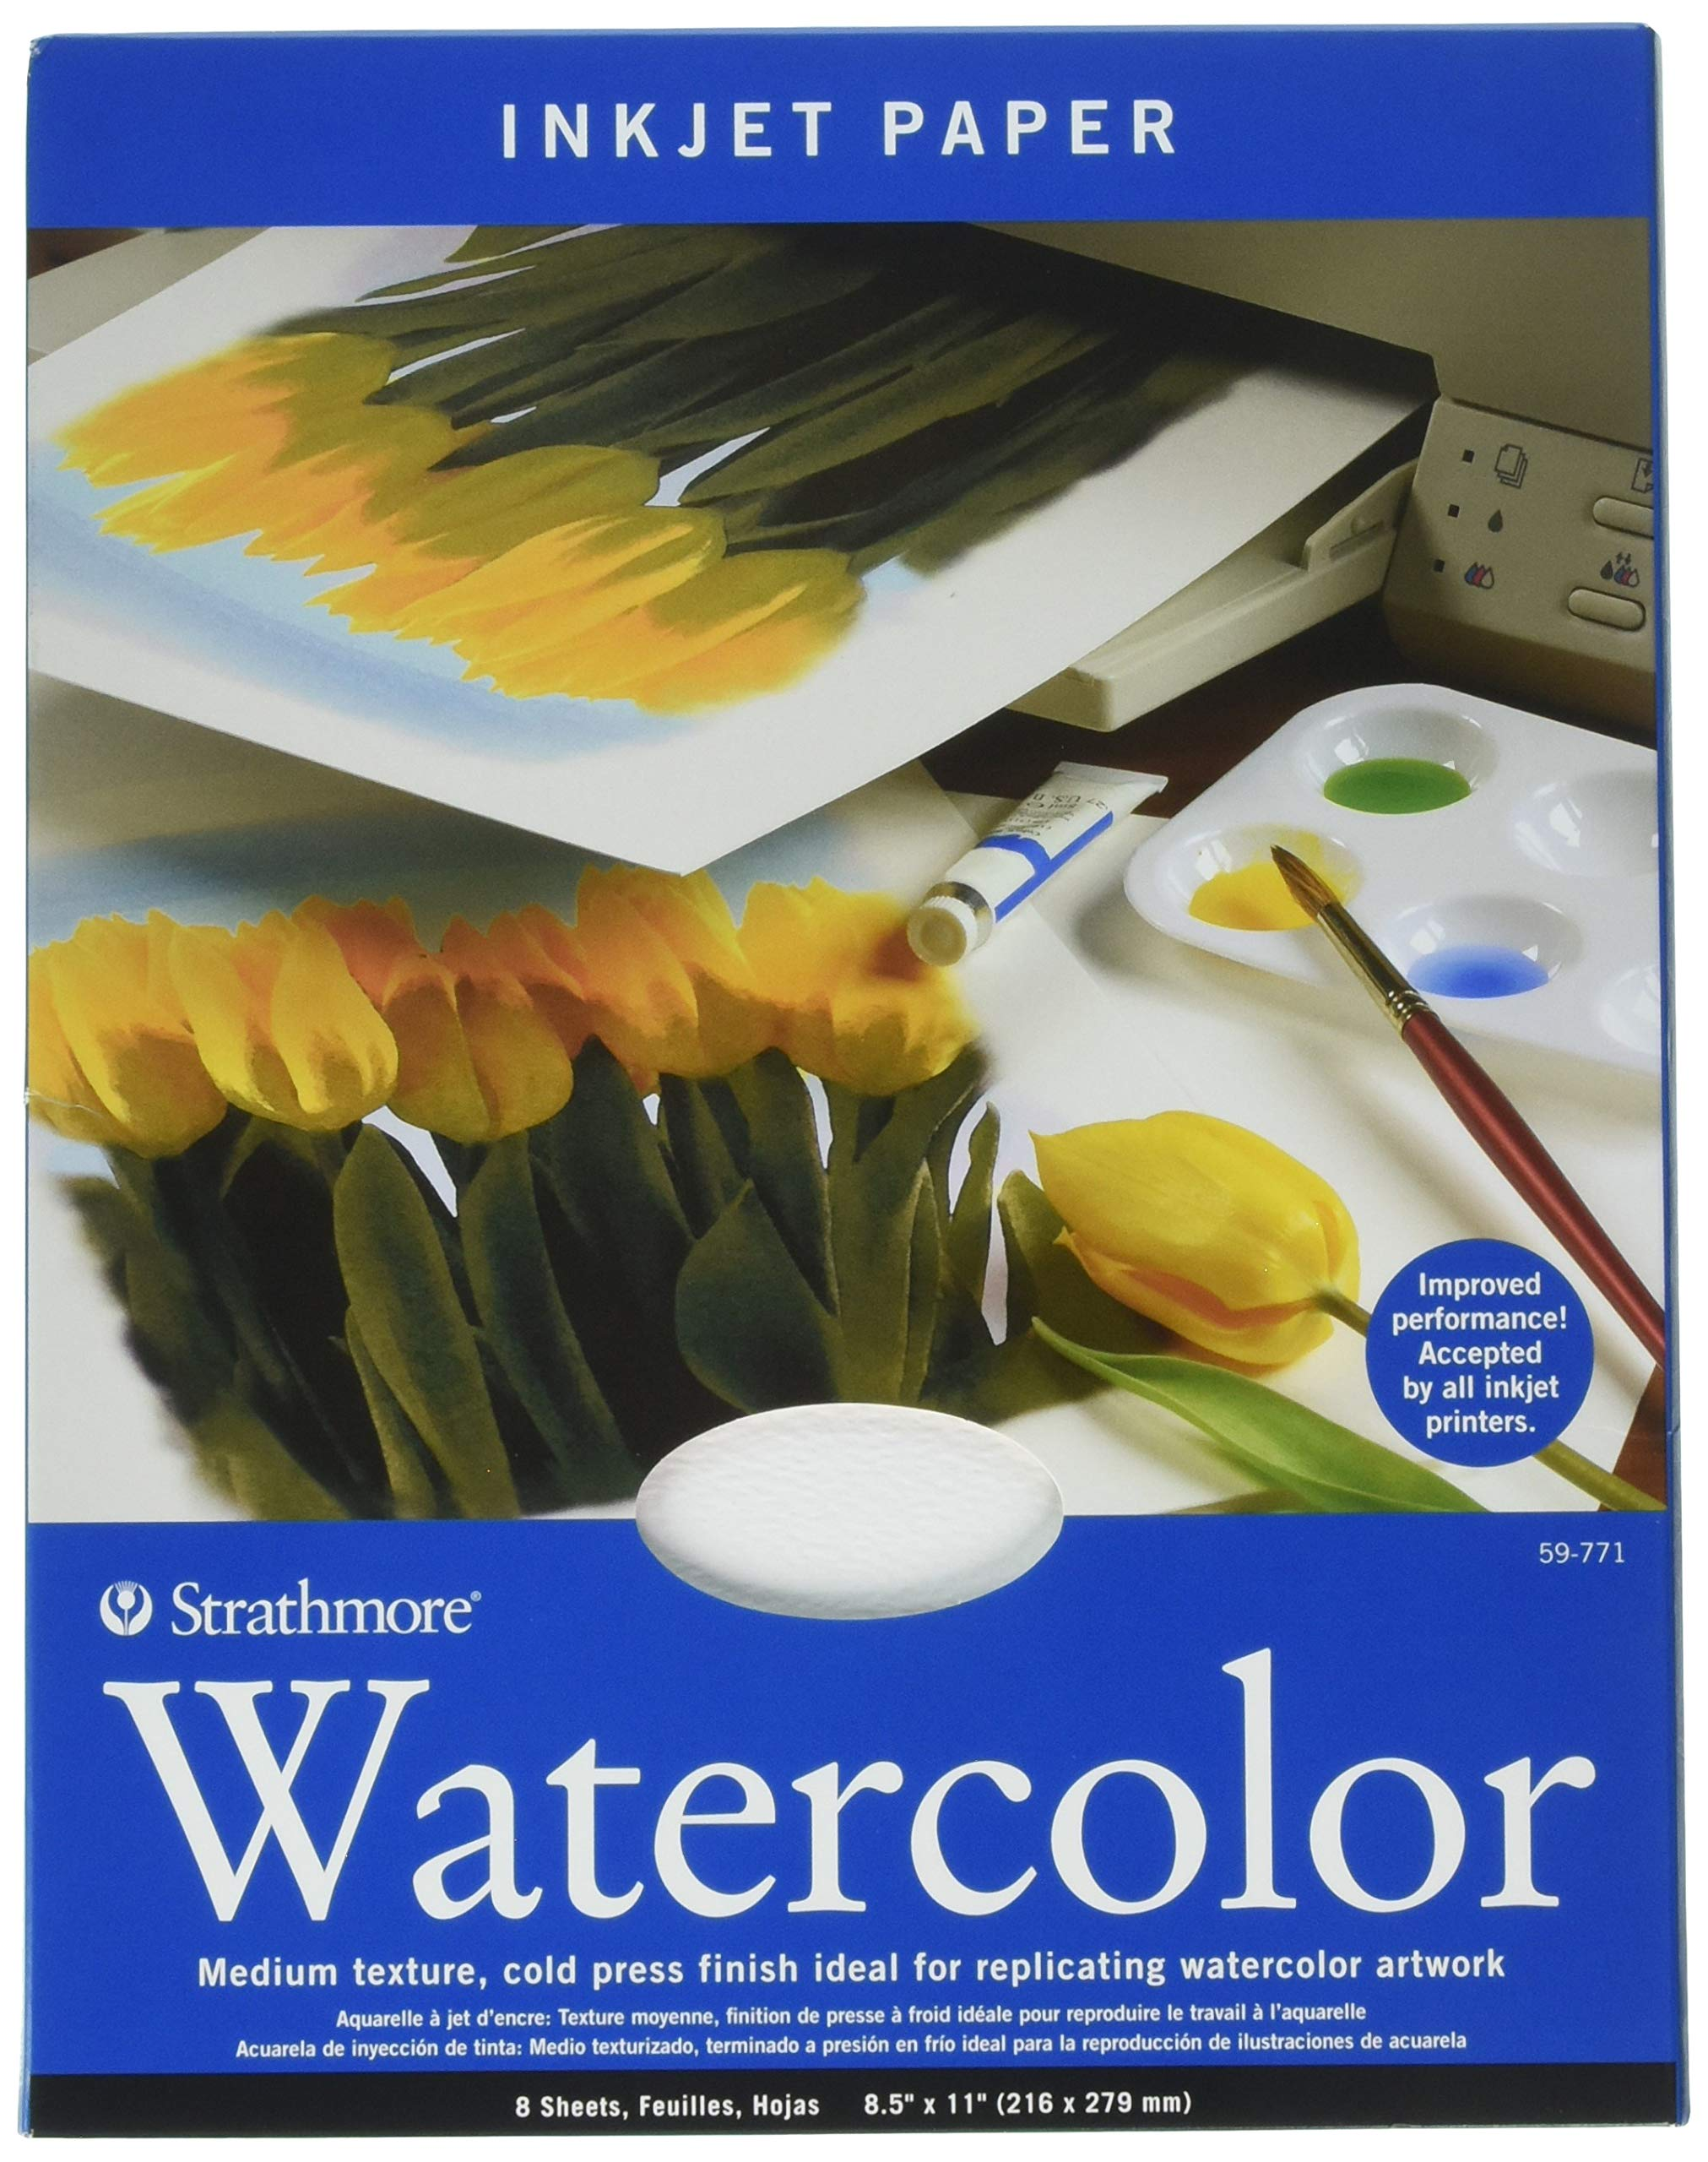 Strathmore 59-771 Watercolor Inkjet Paper, 8.5''x11'', 8 Sheets